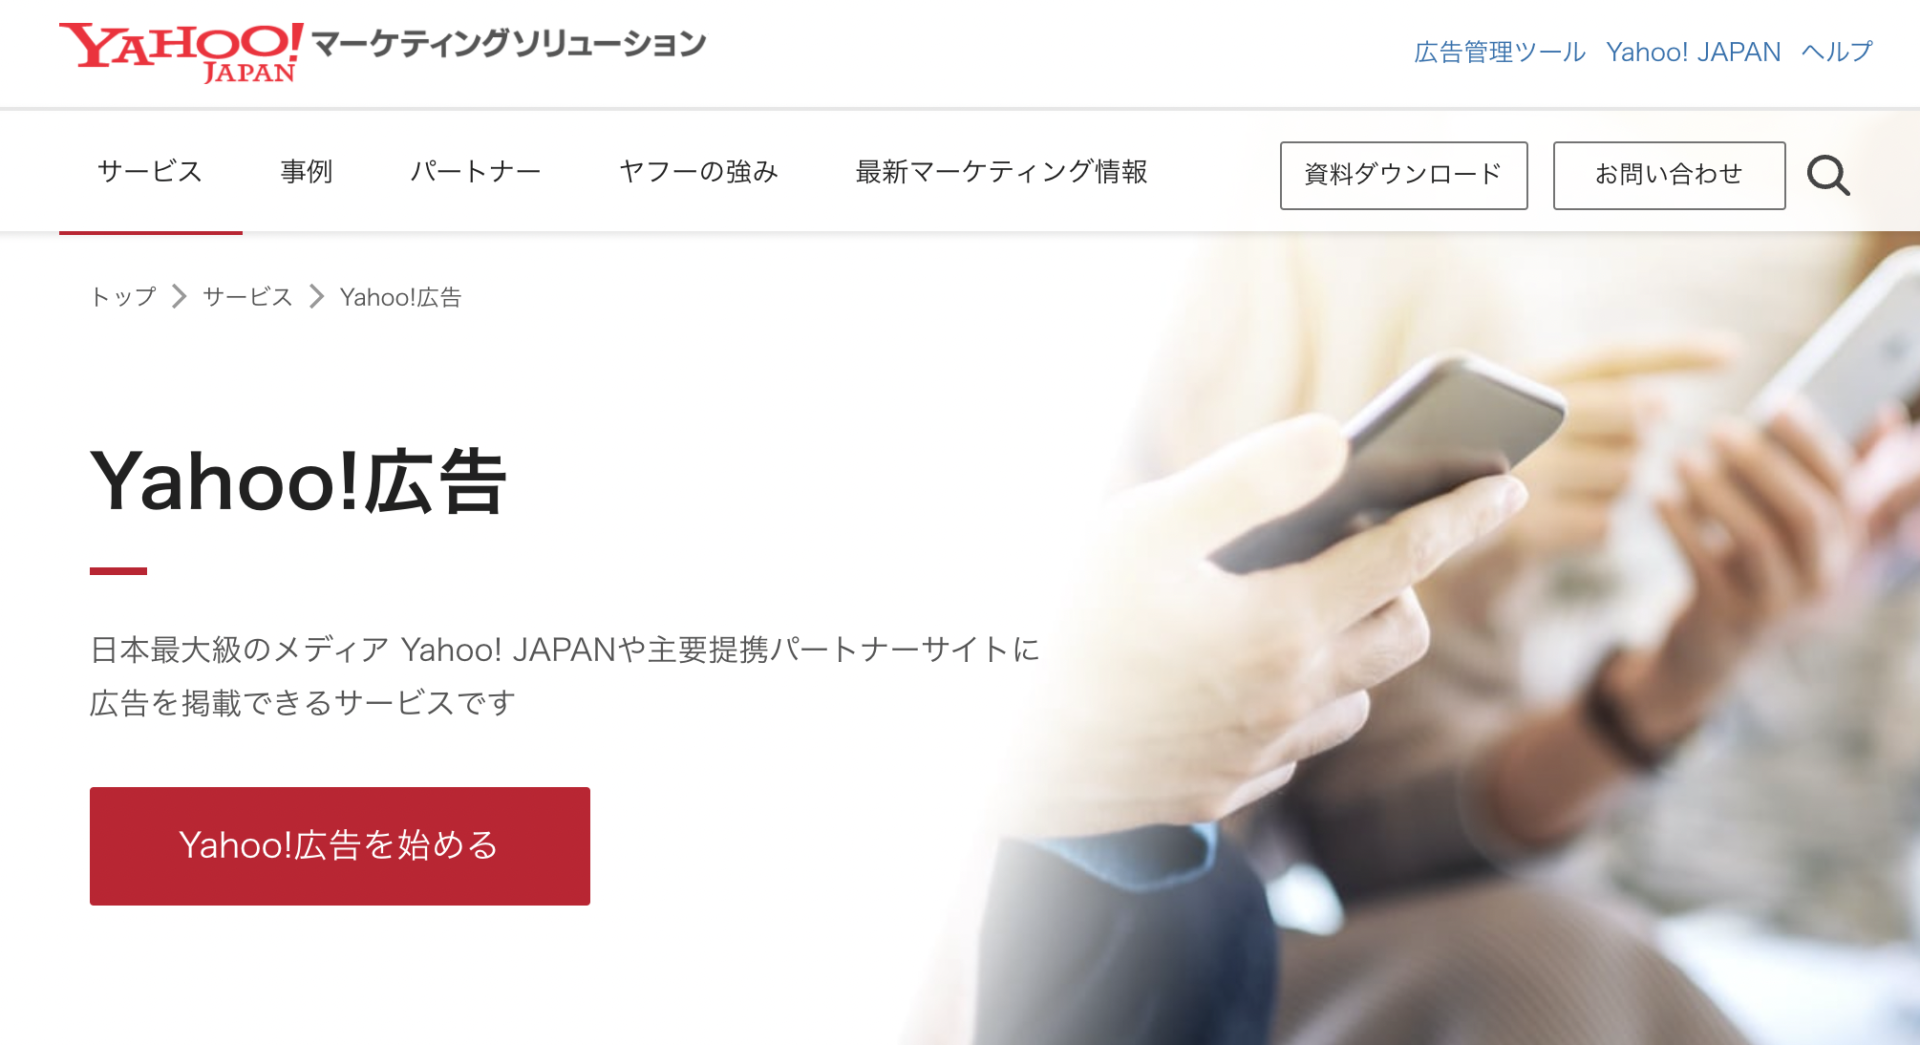 yahoo広告アカウント作成画面